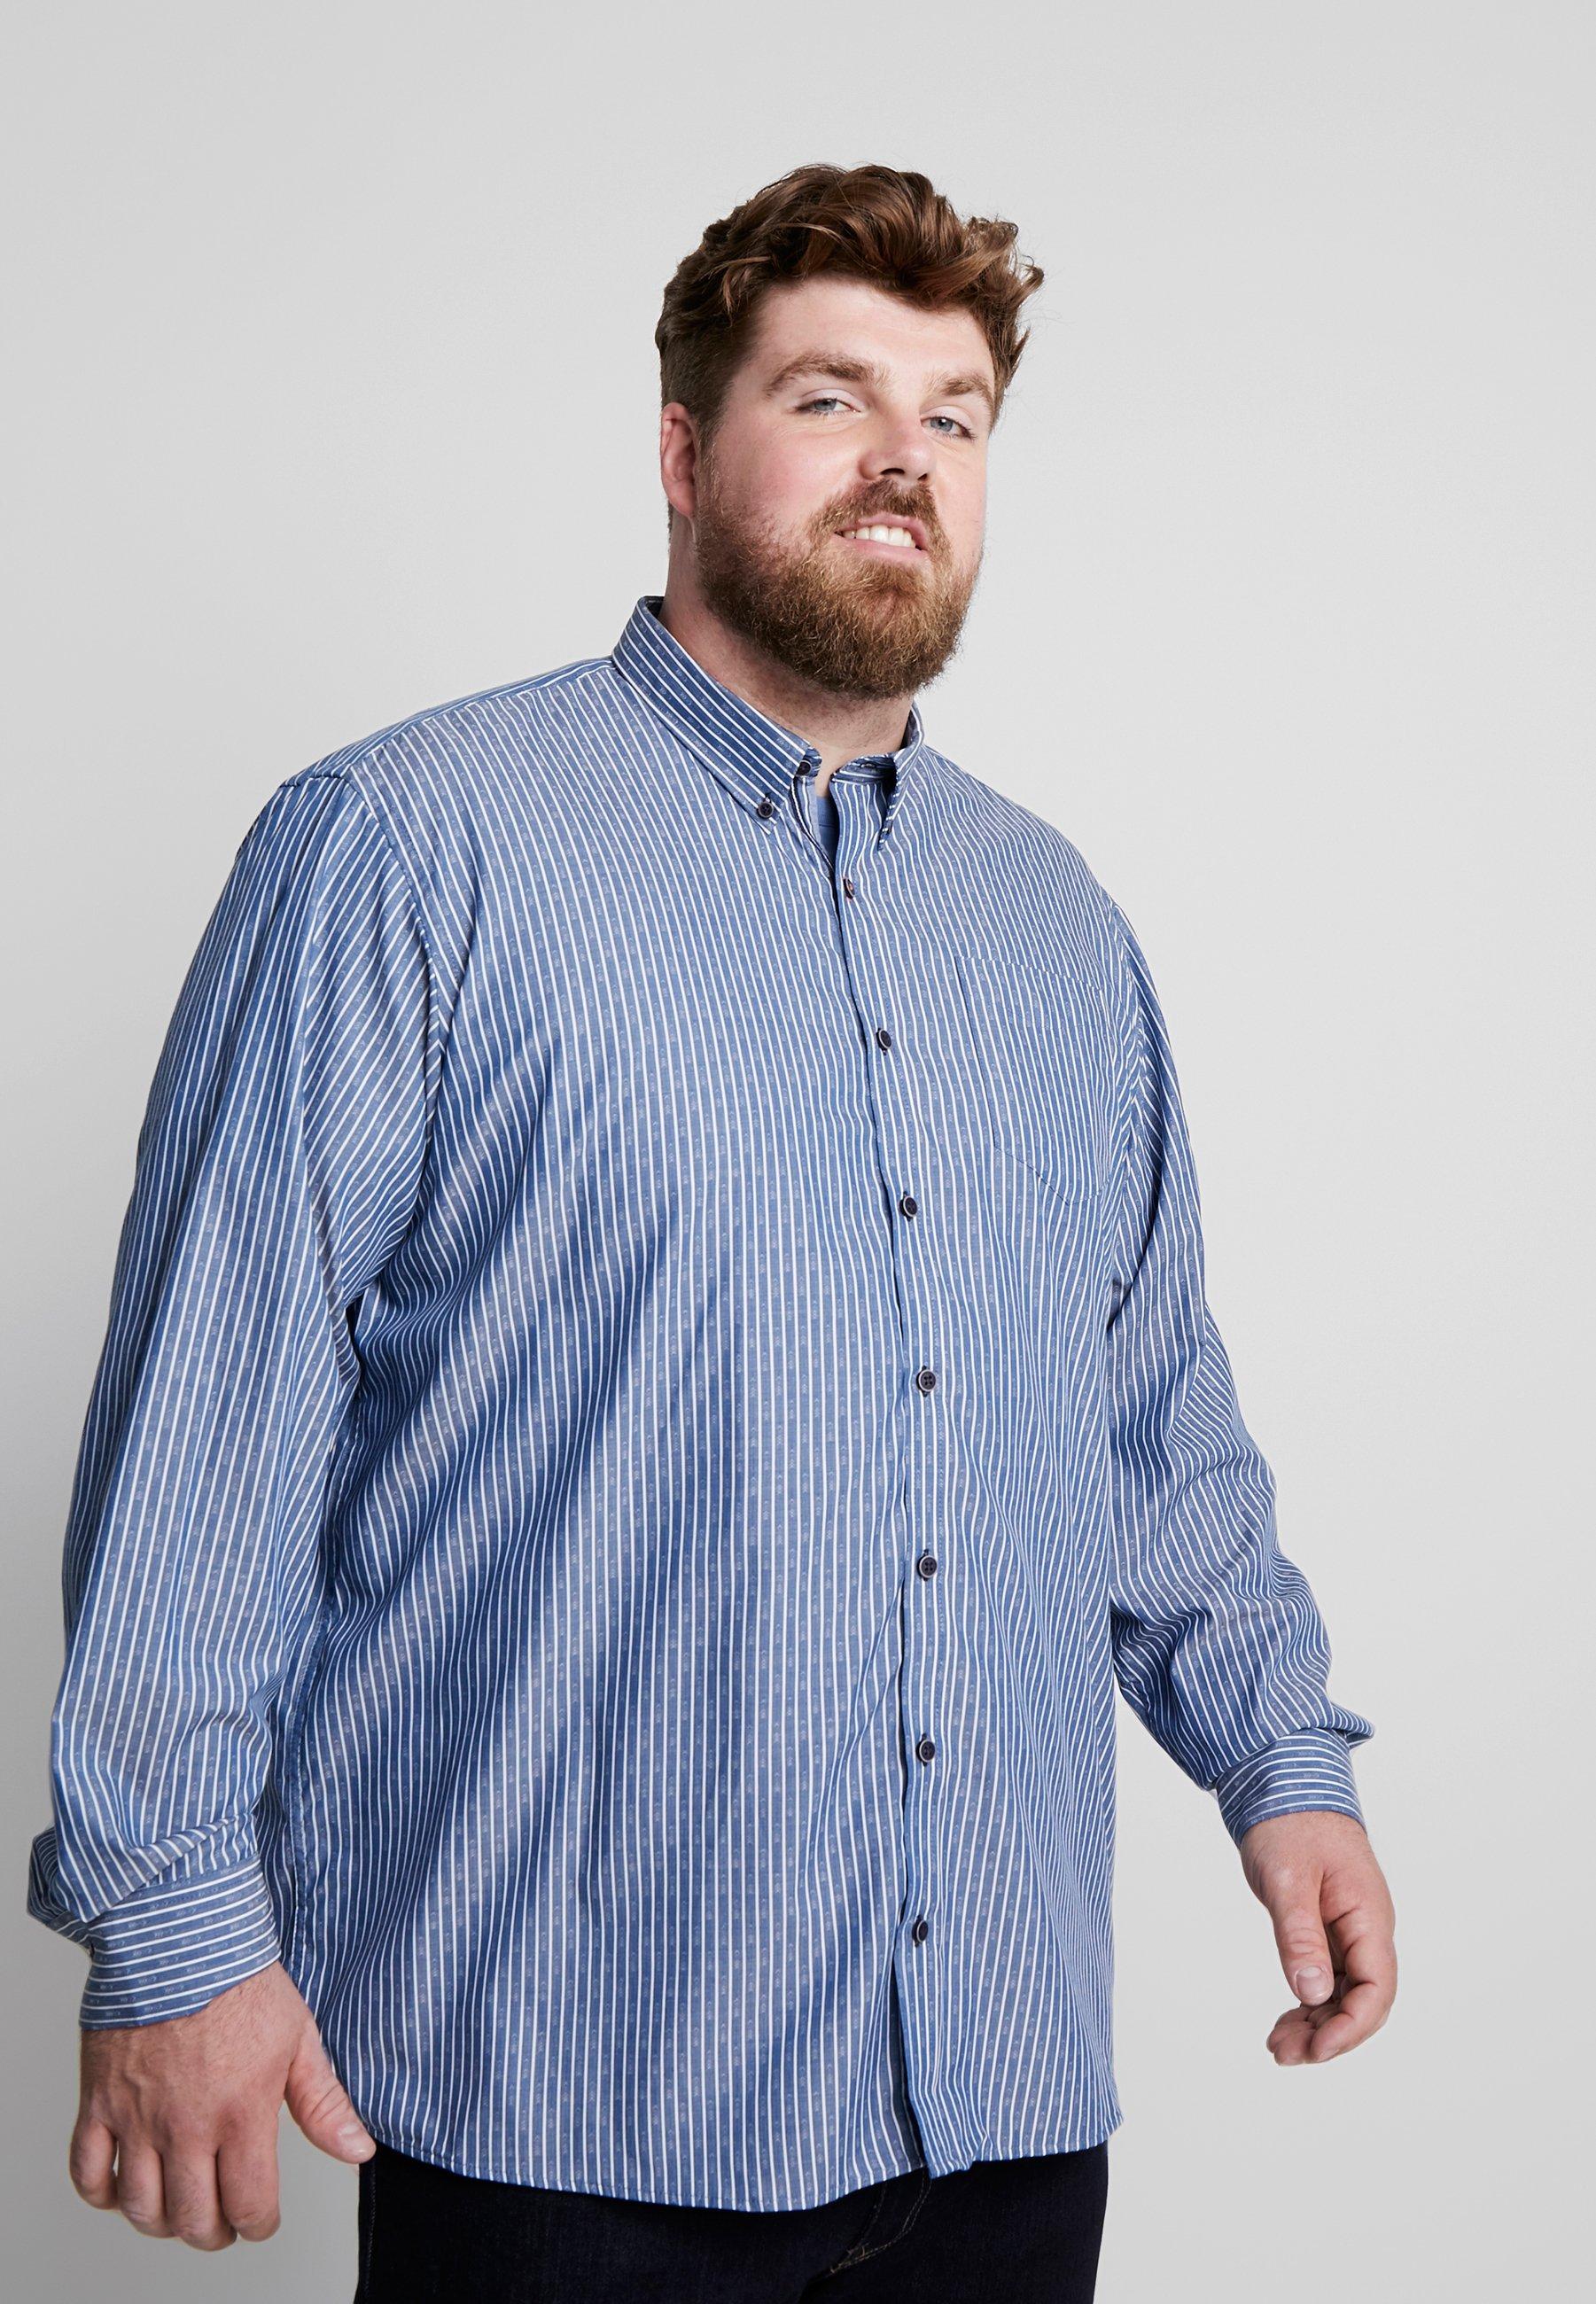 BoxChemise Blue Fit Sportswear Short Blend Comfort Jack´s wOZTuXPki